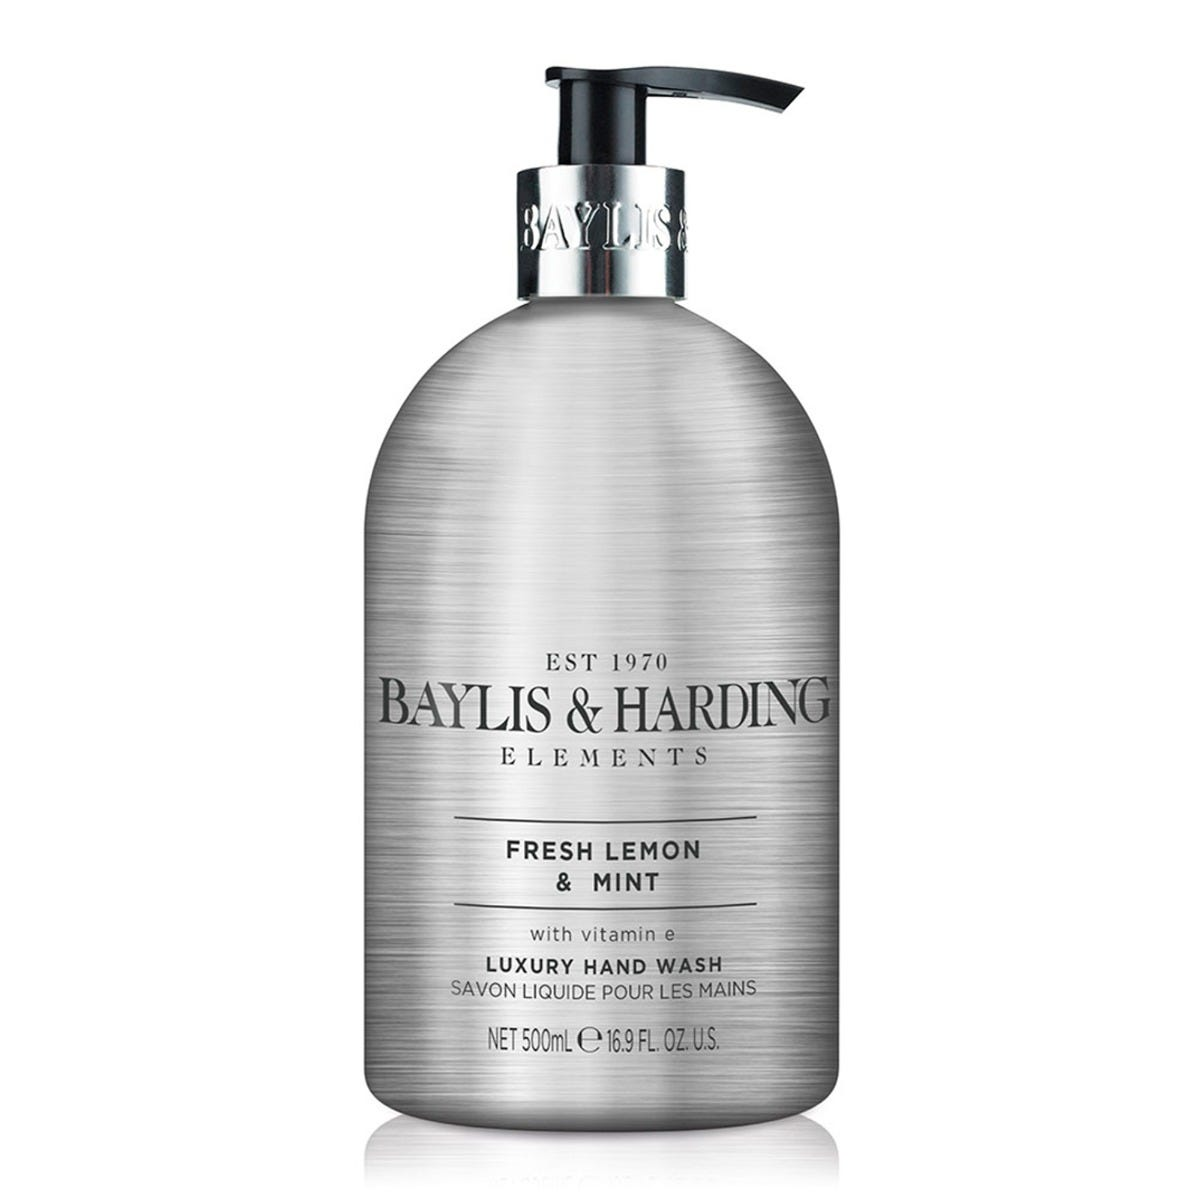 Jabón para manos Baylis & Harding® aroma limón y menta